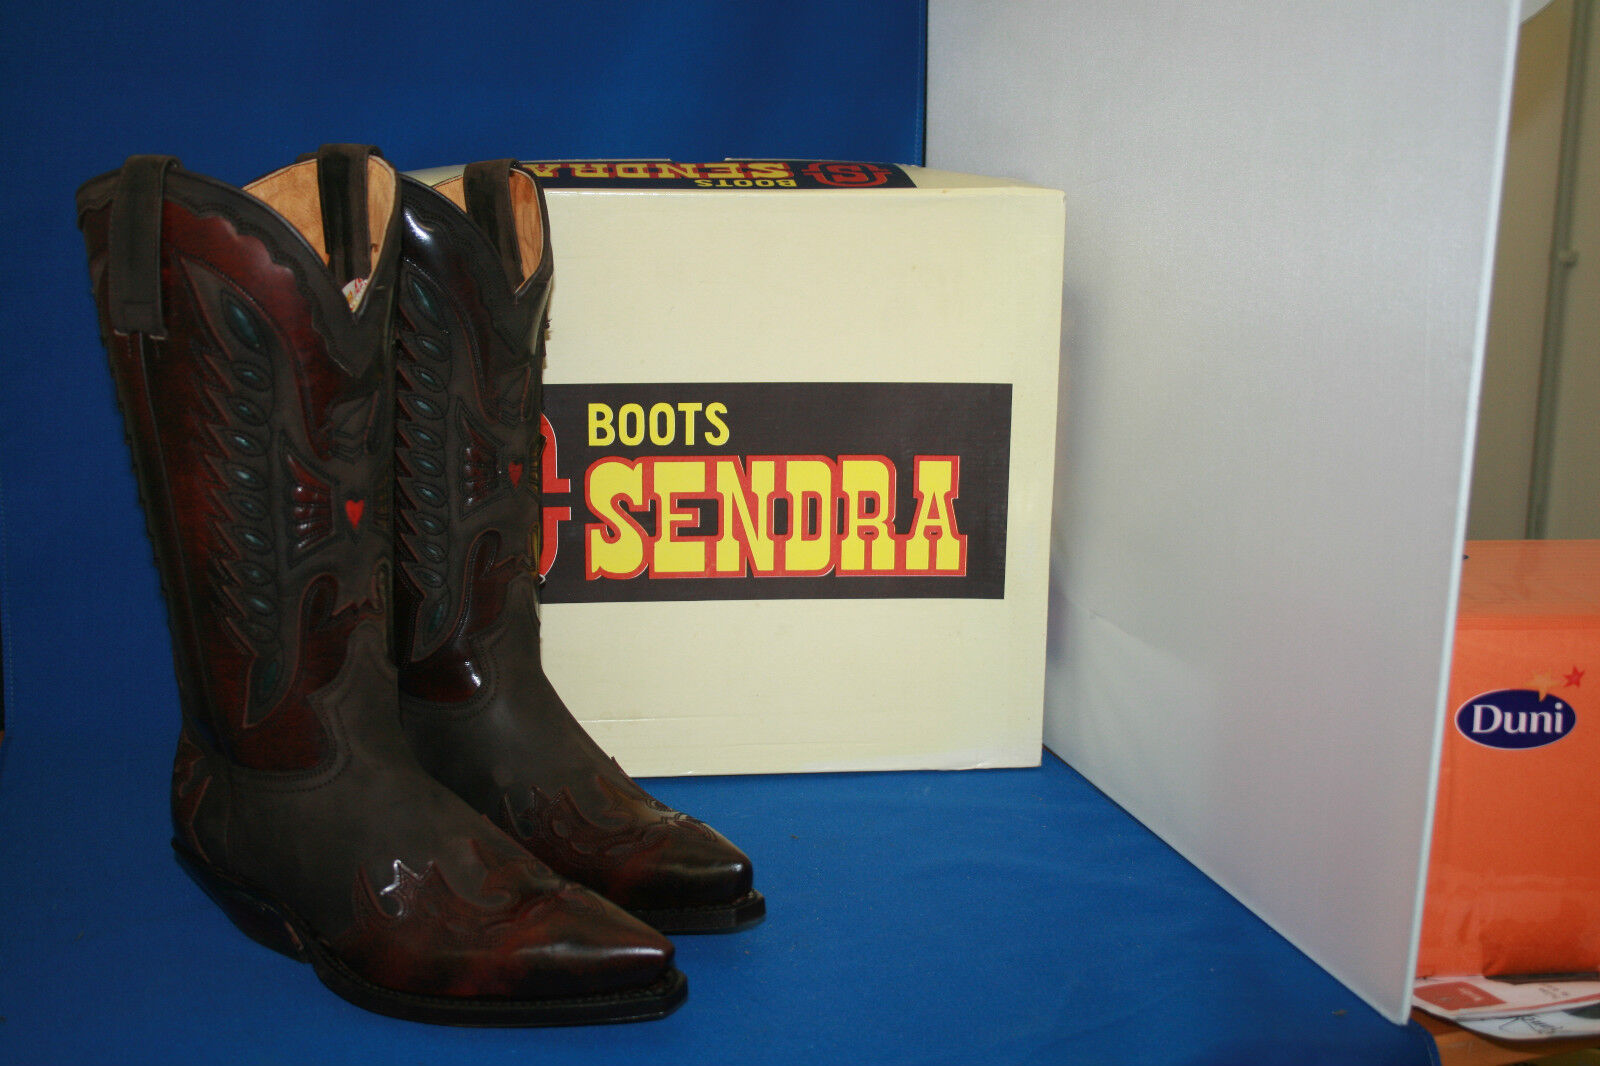 Sendra Boots Stivali Western Stivali Cowboy Stivali Sendra GR. 37 DESIGN NUOVO 4 1/2